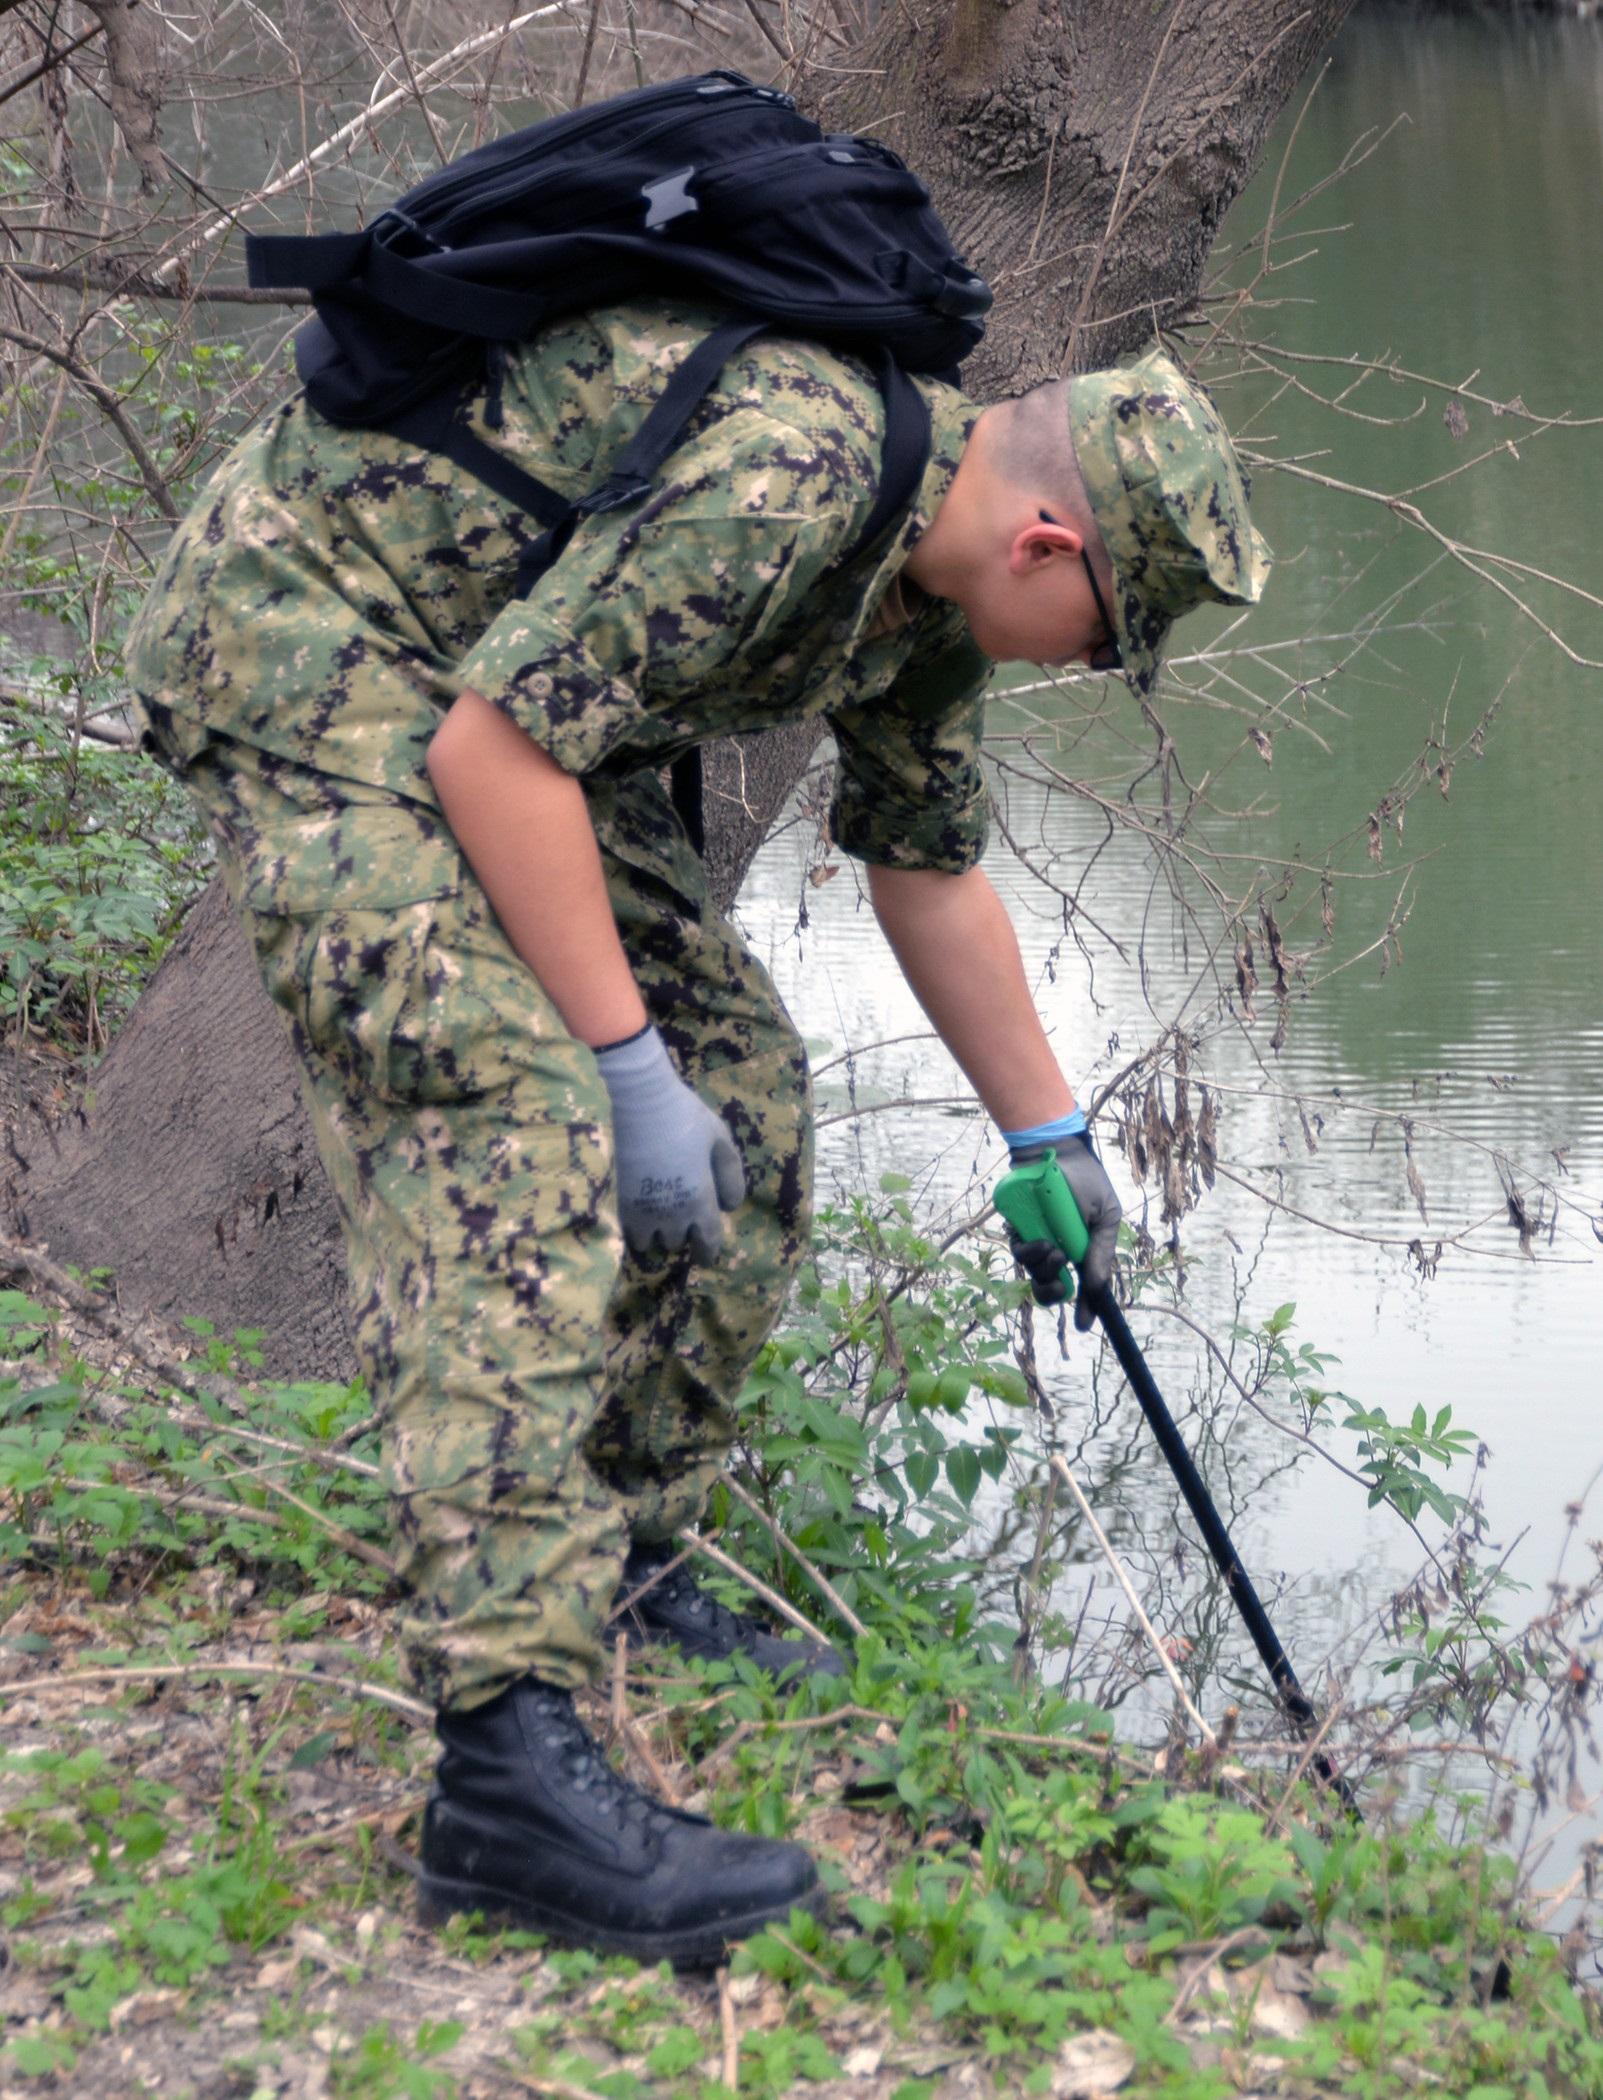 Basura Bash Waterways Cleanup Effort Celebrates 25 Years